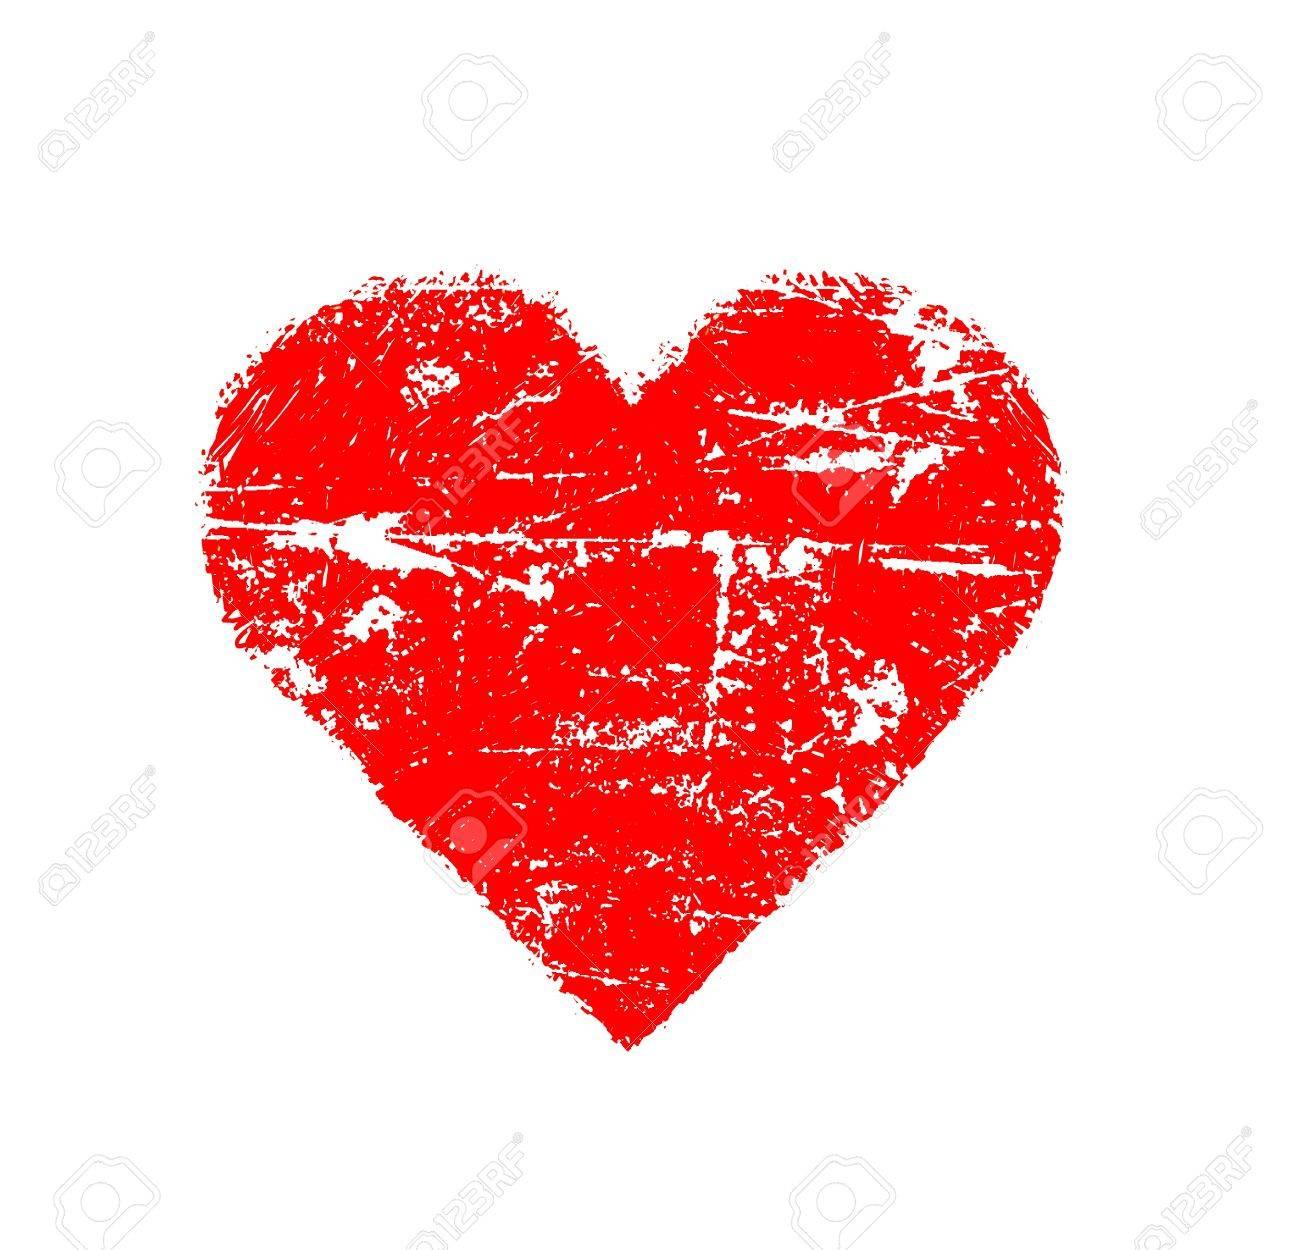 Abstract love symbol - 13050705